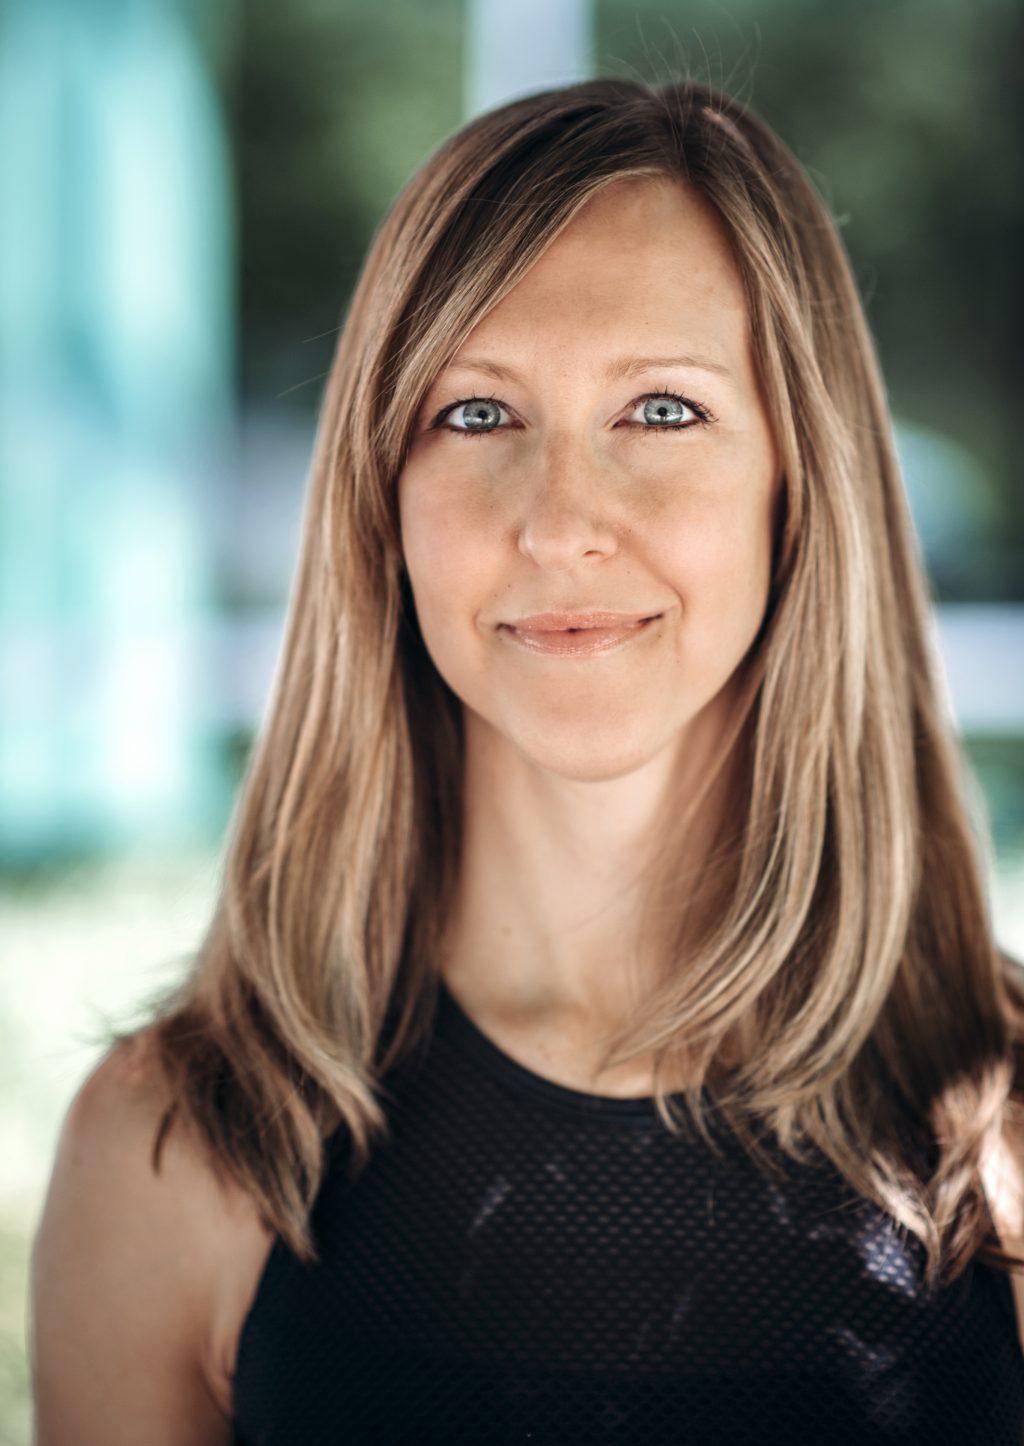 Personal Trainer Chicago, Illinois - Stephanie Madden